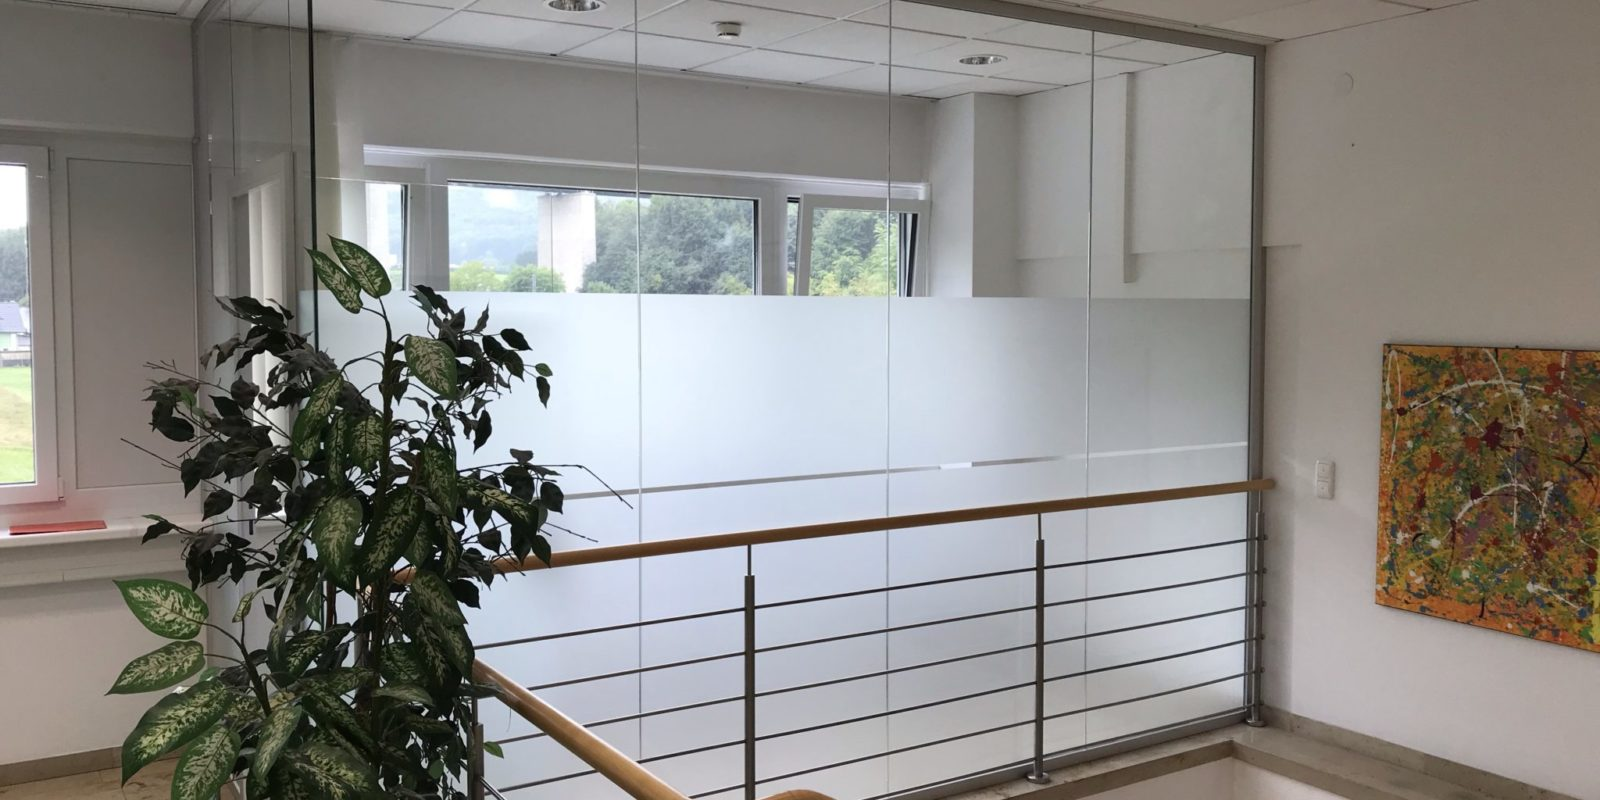 Milchglasfolie Büro